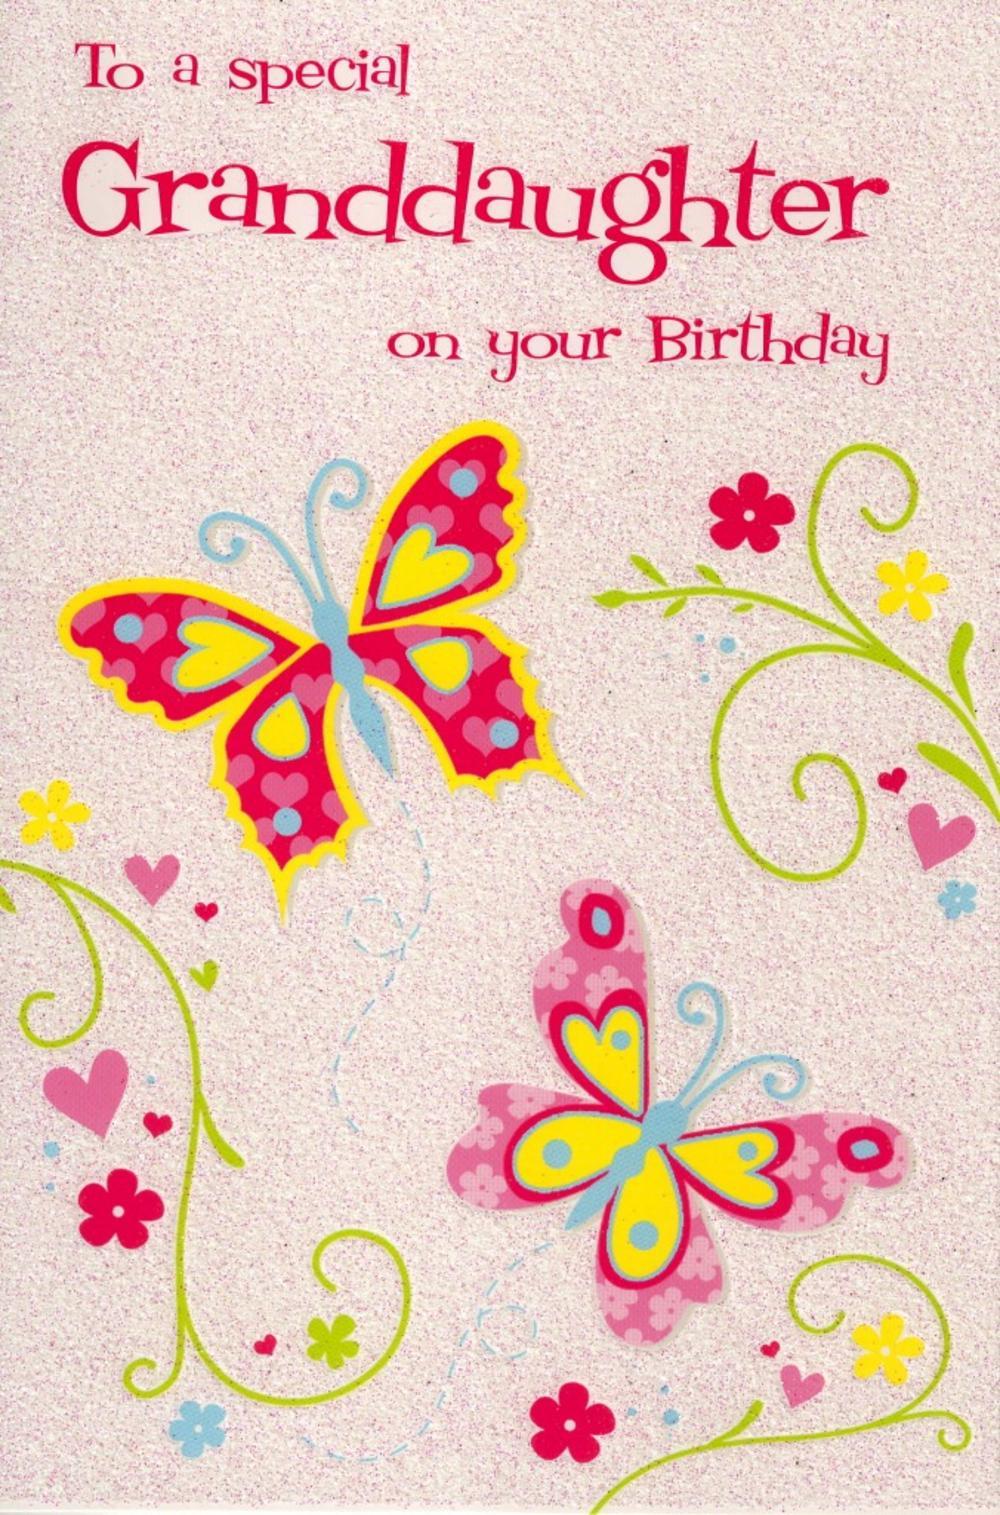 Granddaughter Birthday Greeting Card